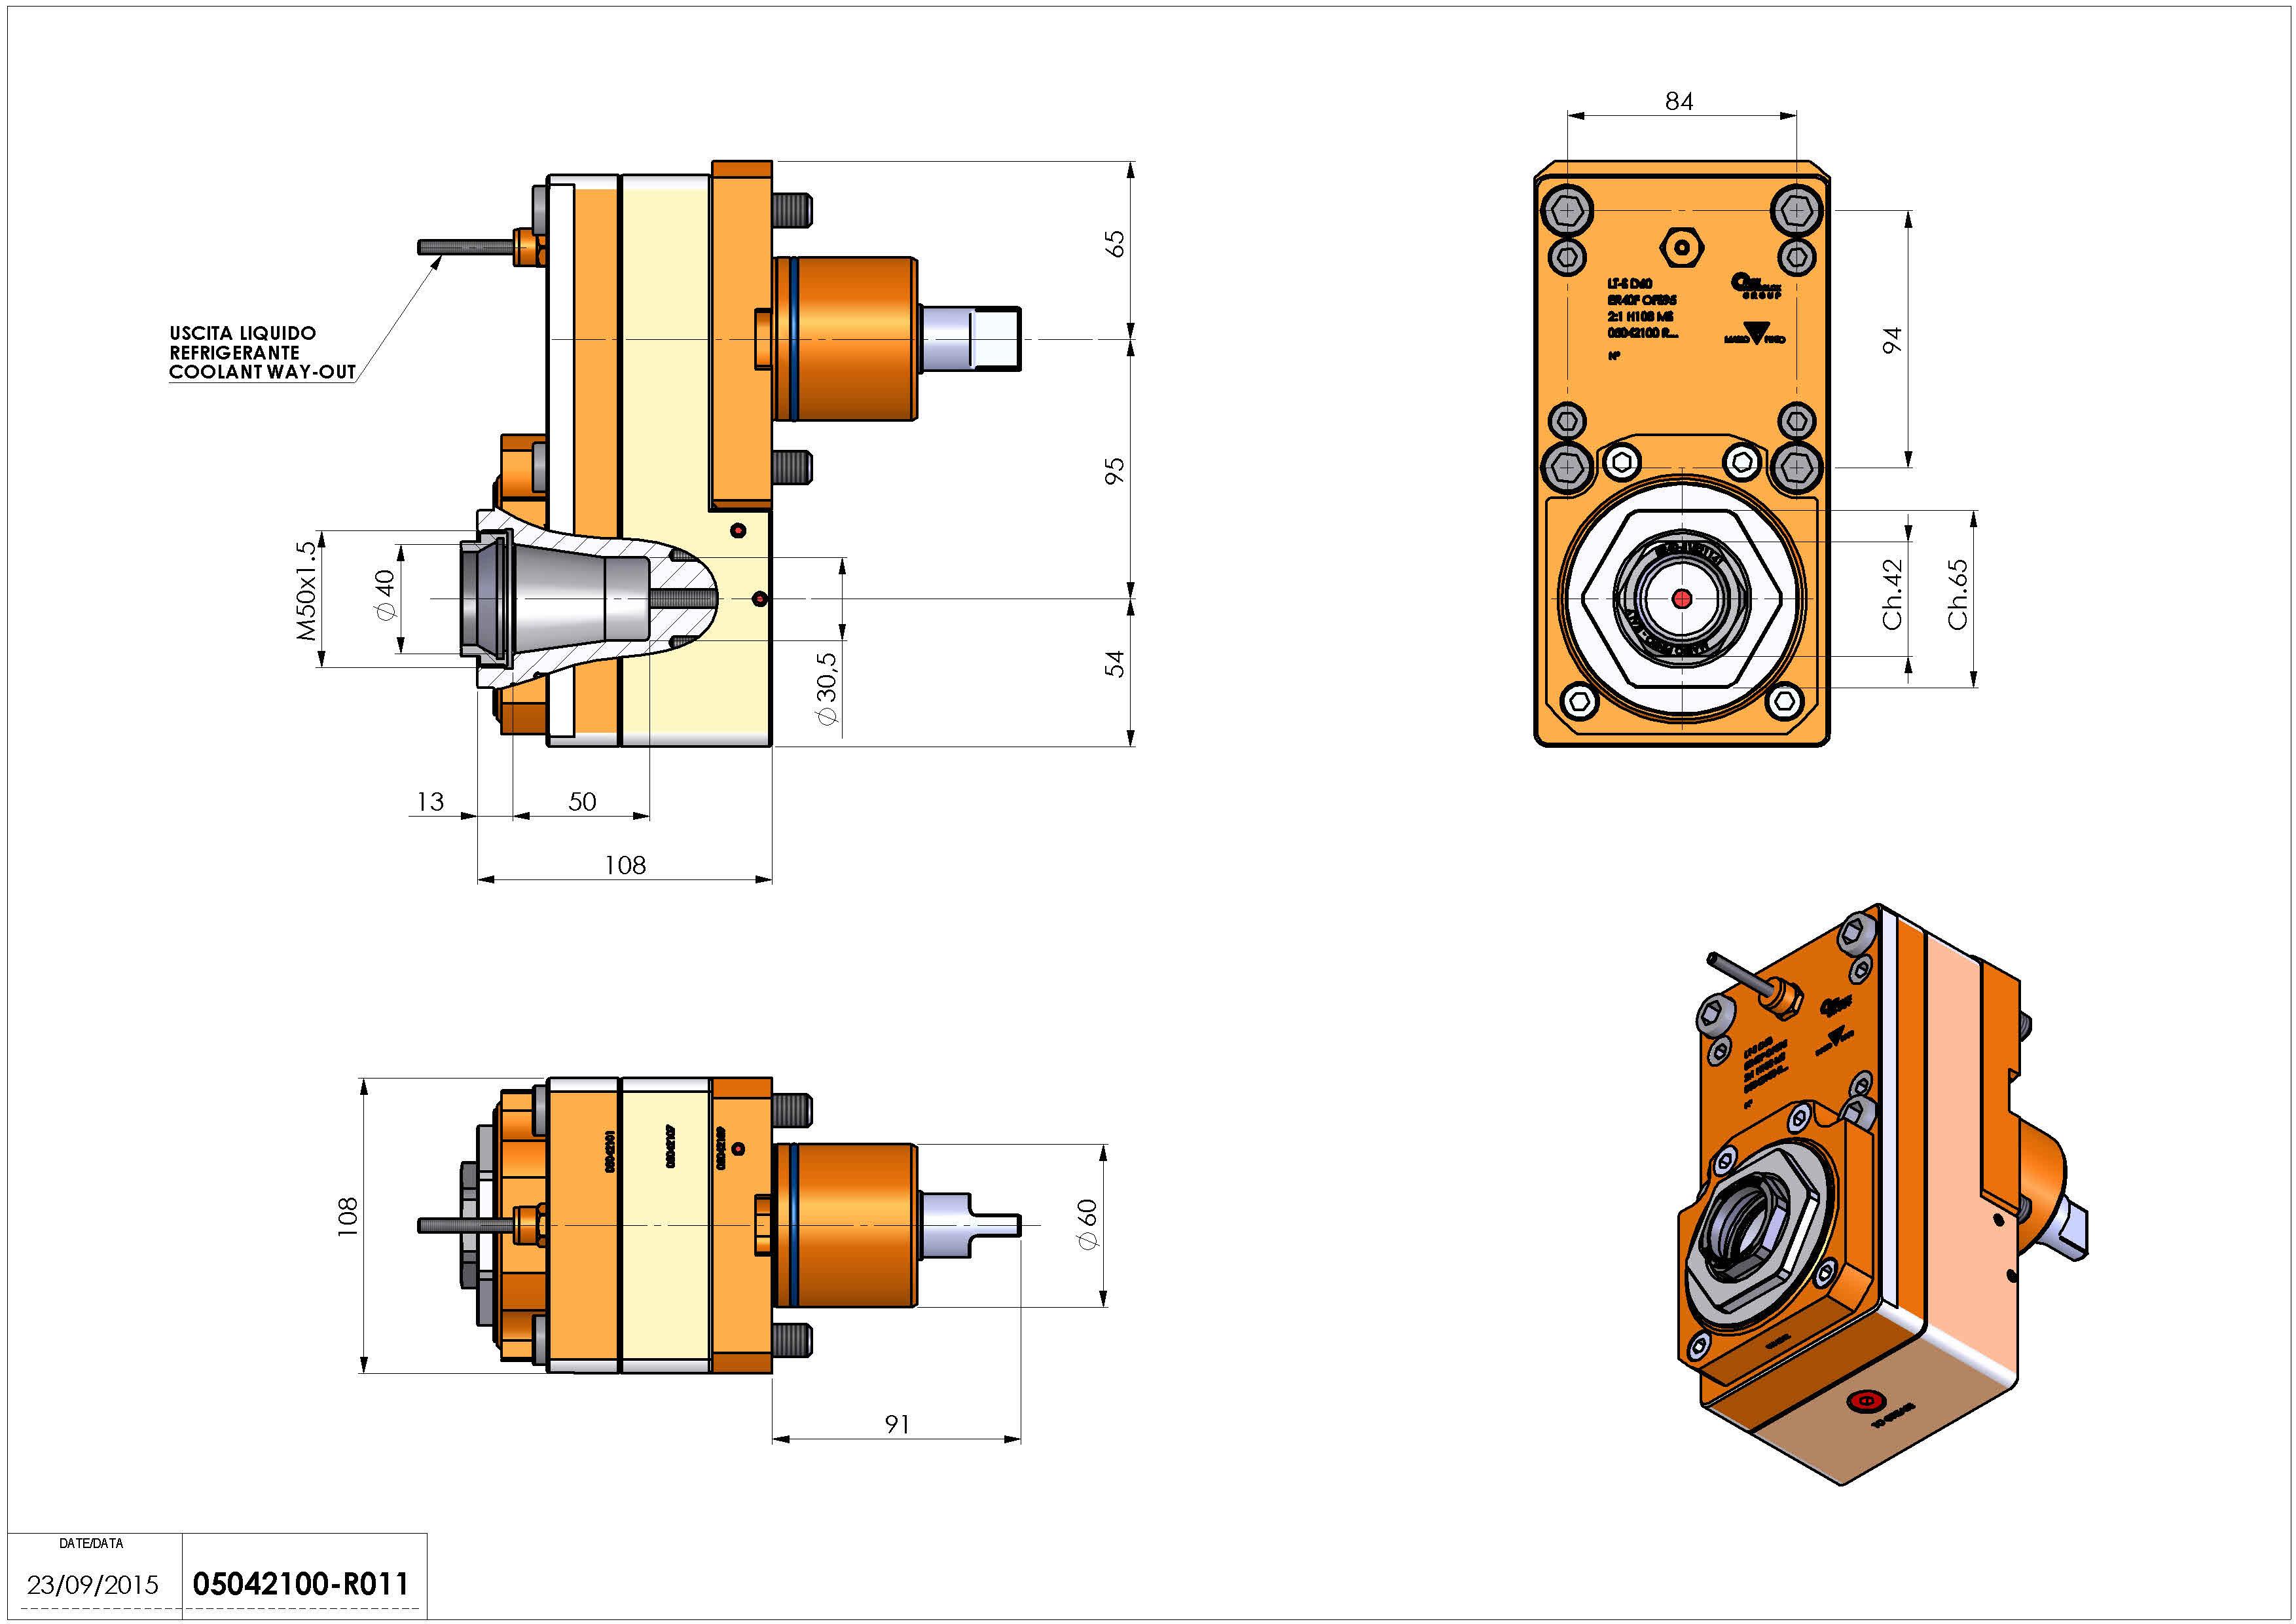 Technical image - LT-S D60 ER40FOF95 2:1 HS H108.